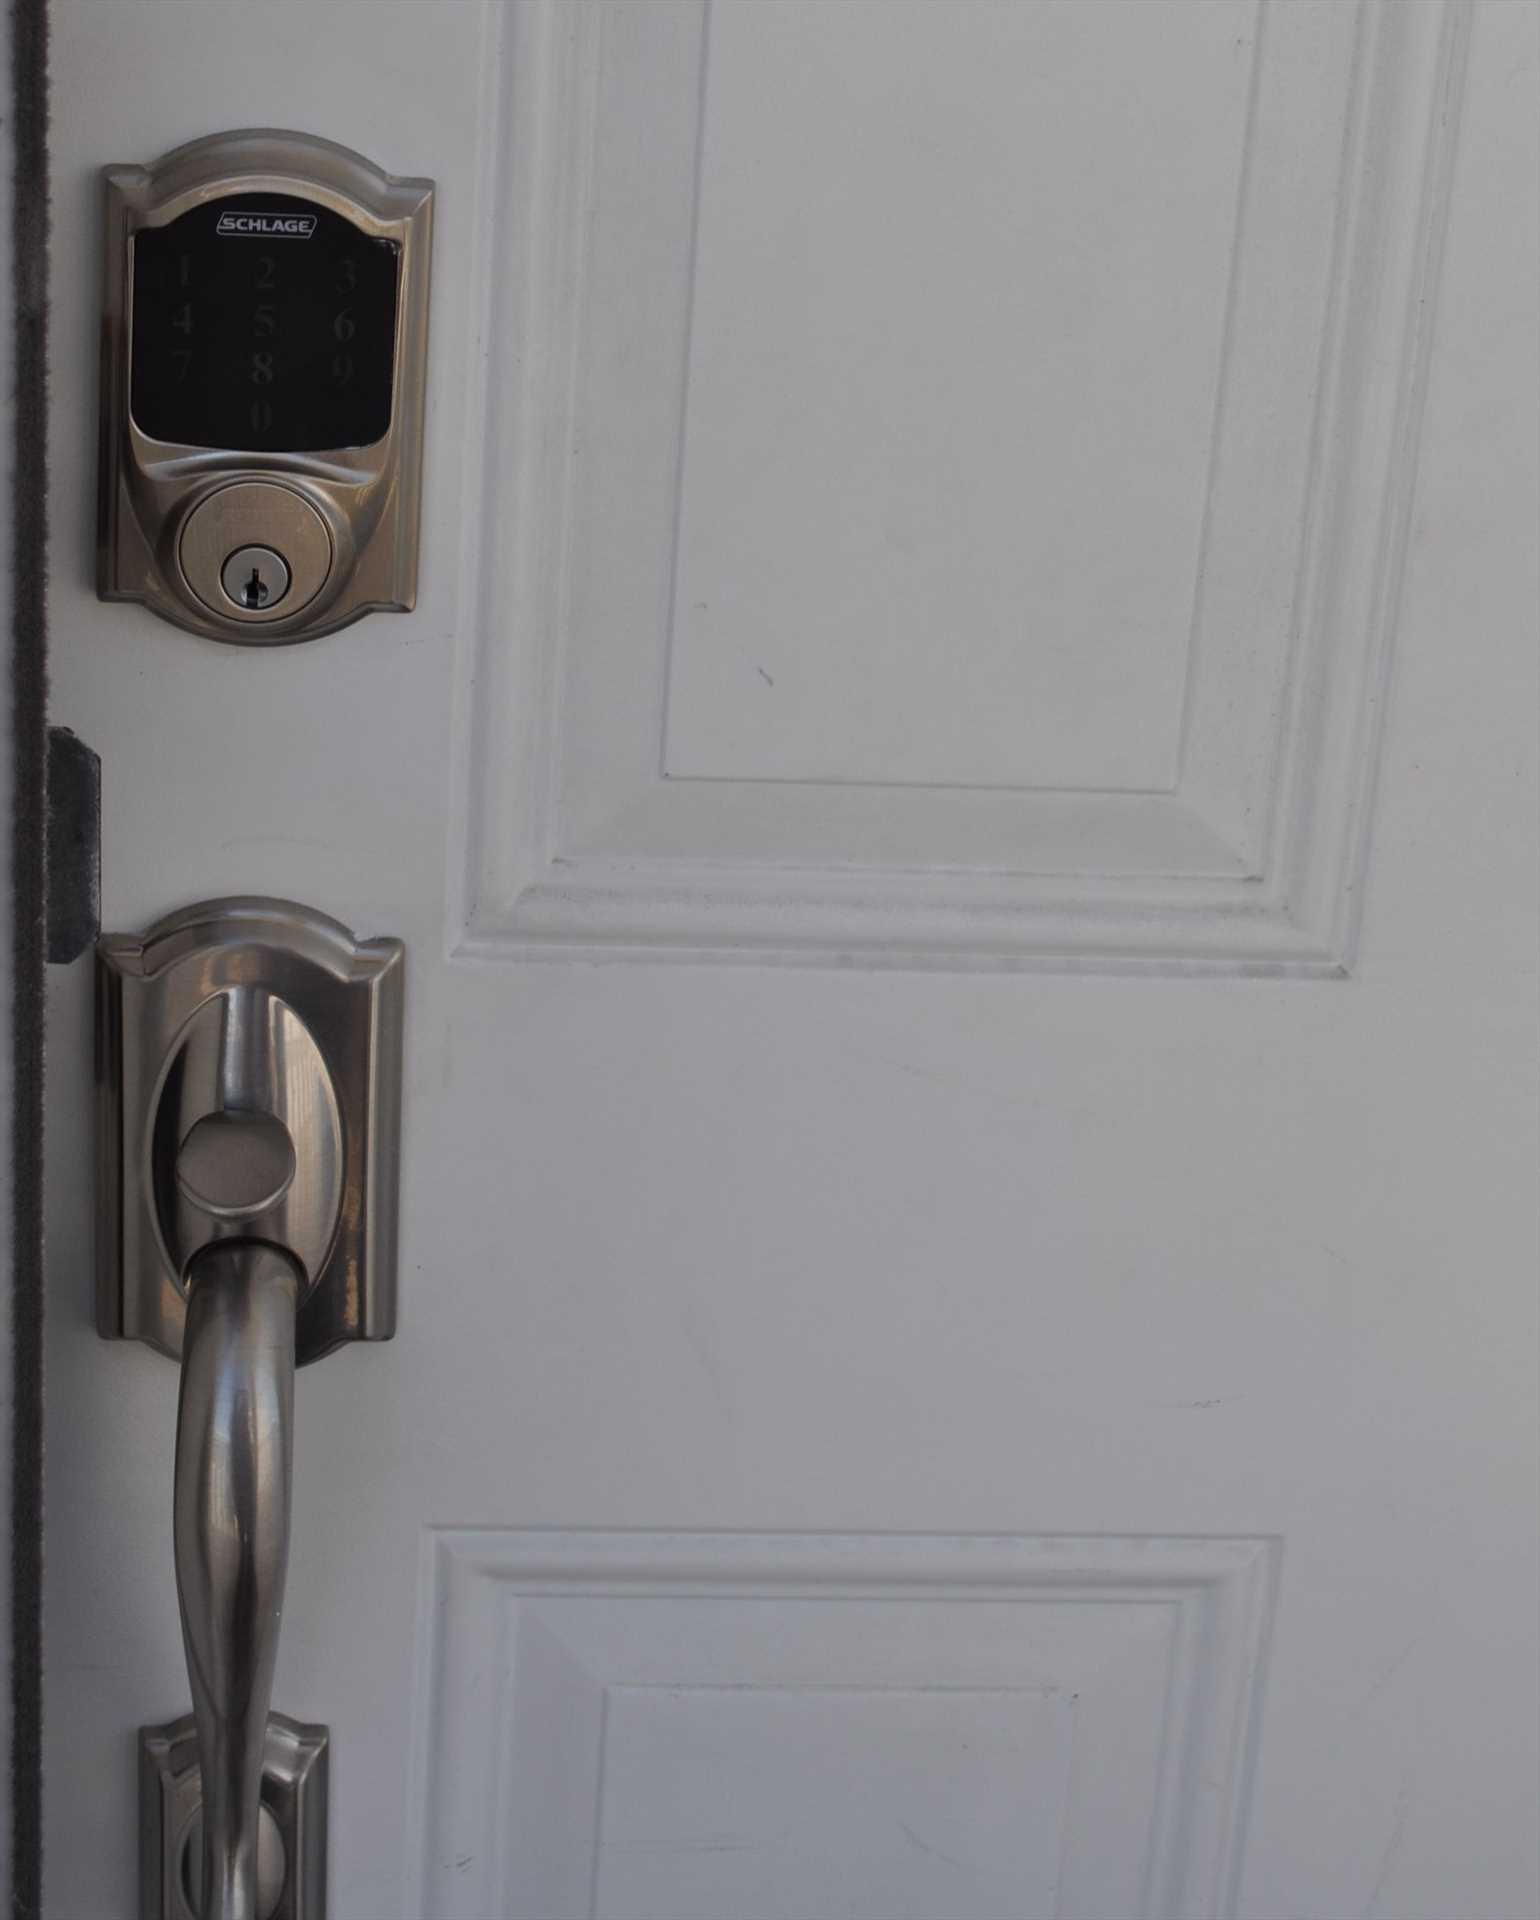 Electronic Entry lock